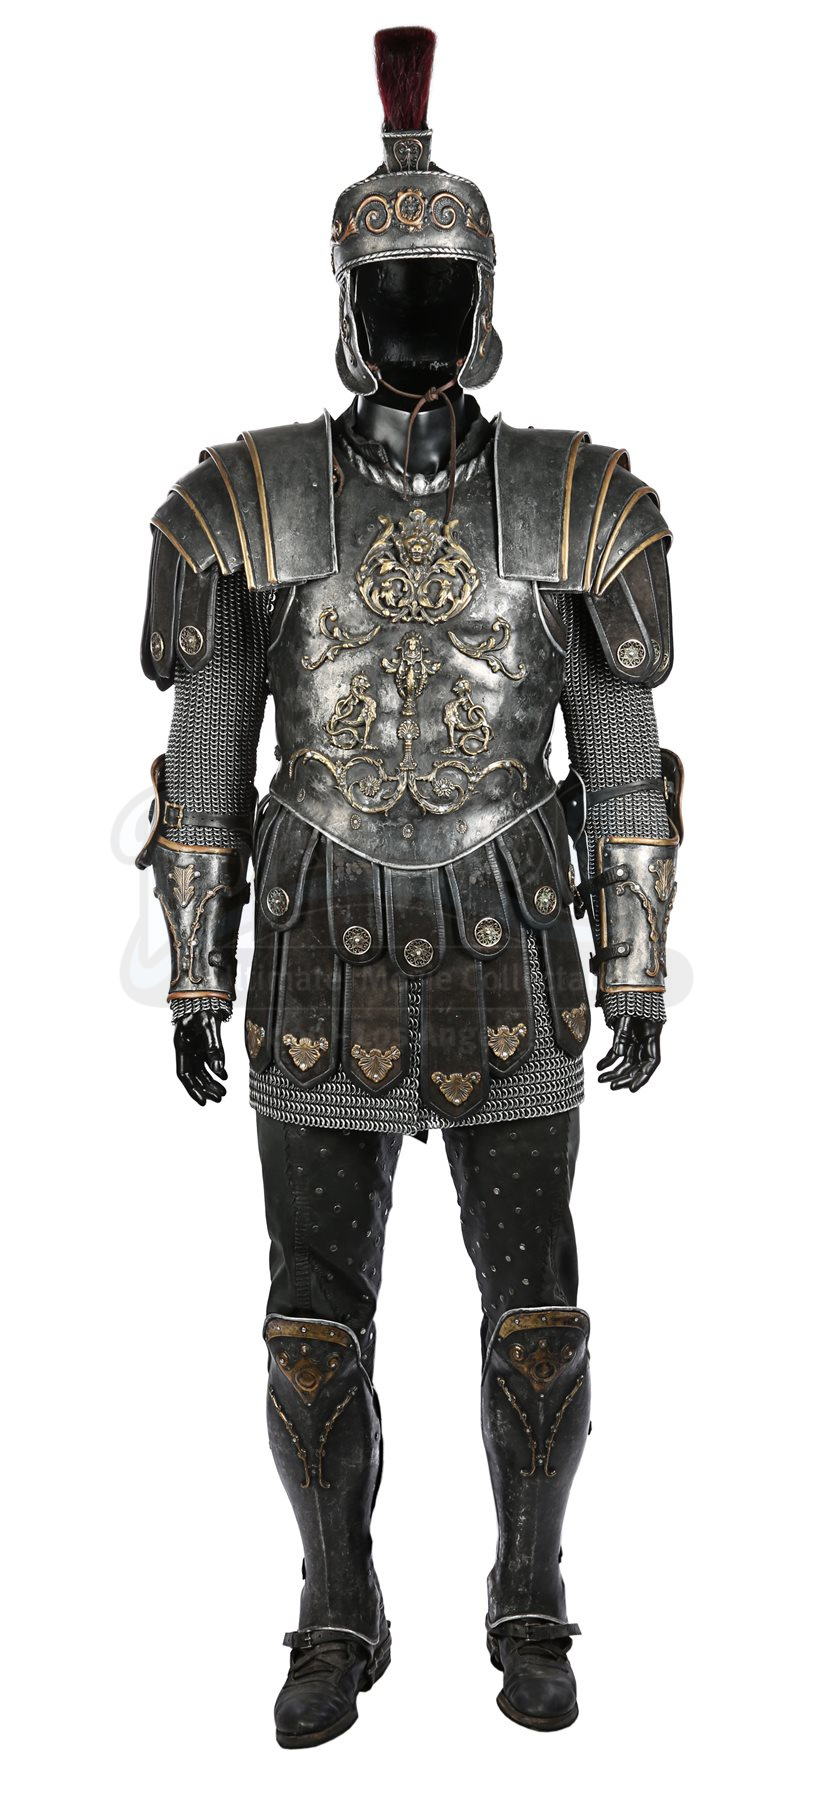 King Arthur 2004 King Arthur S Clive Owen Suit Of Armour Current Price 6000